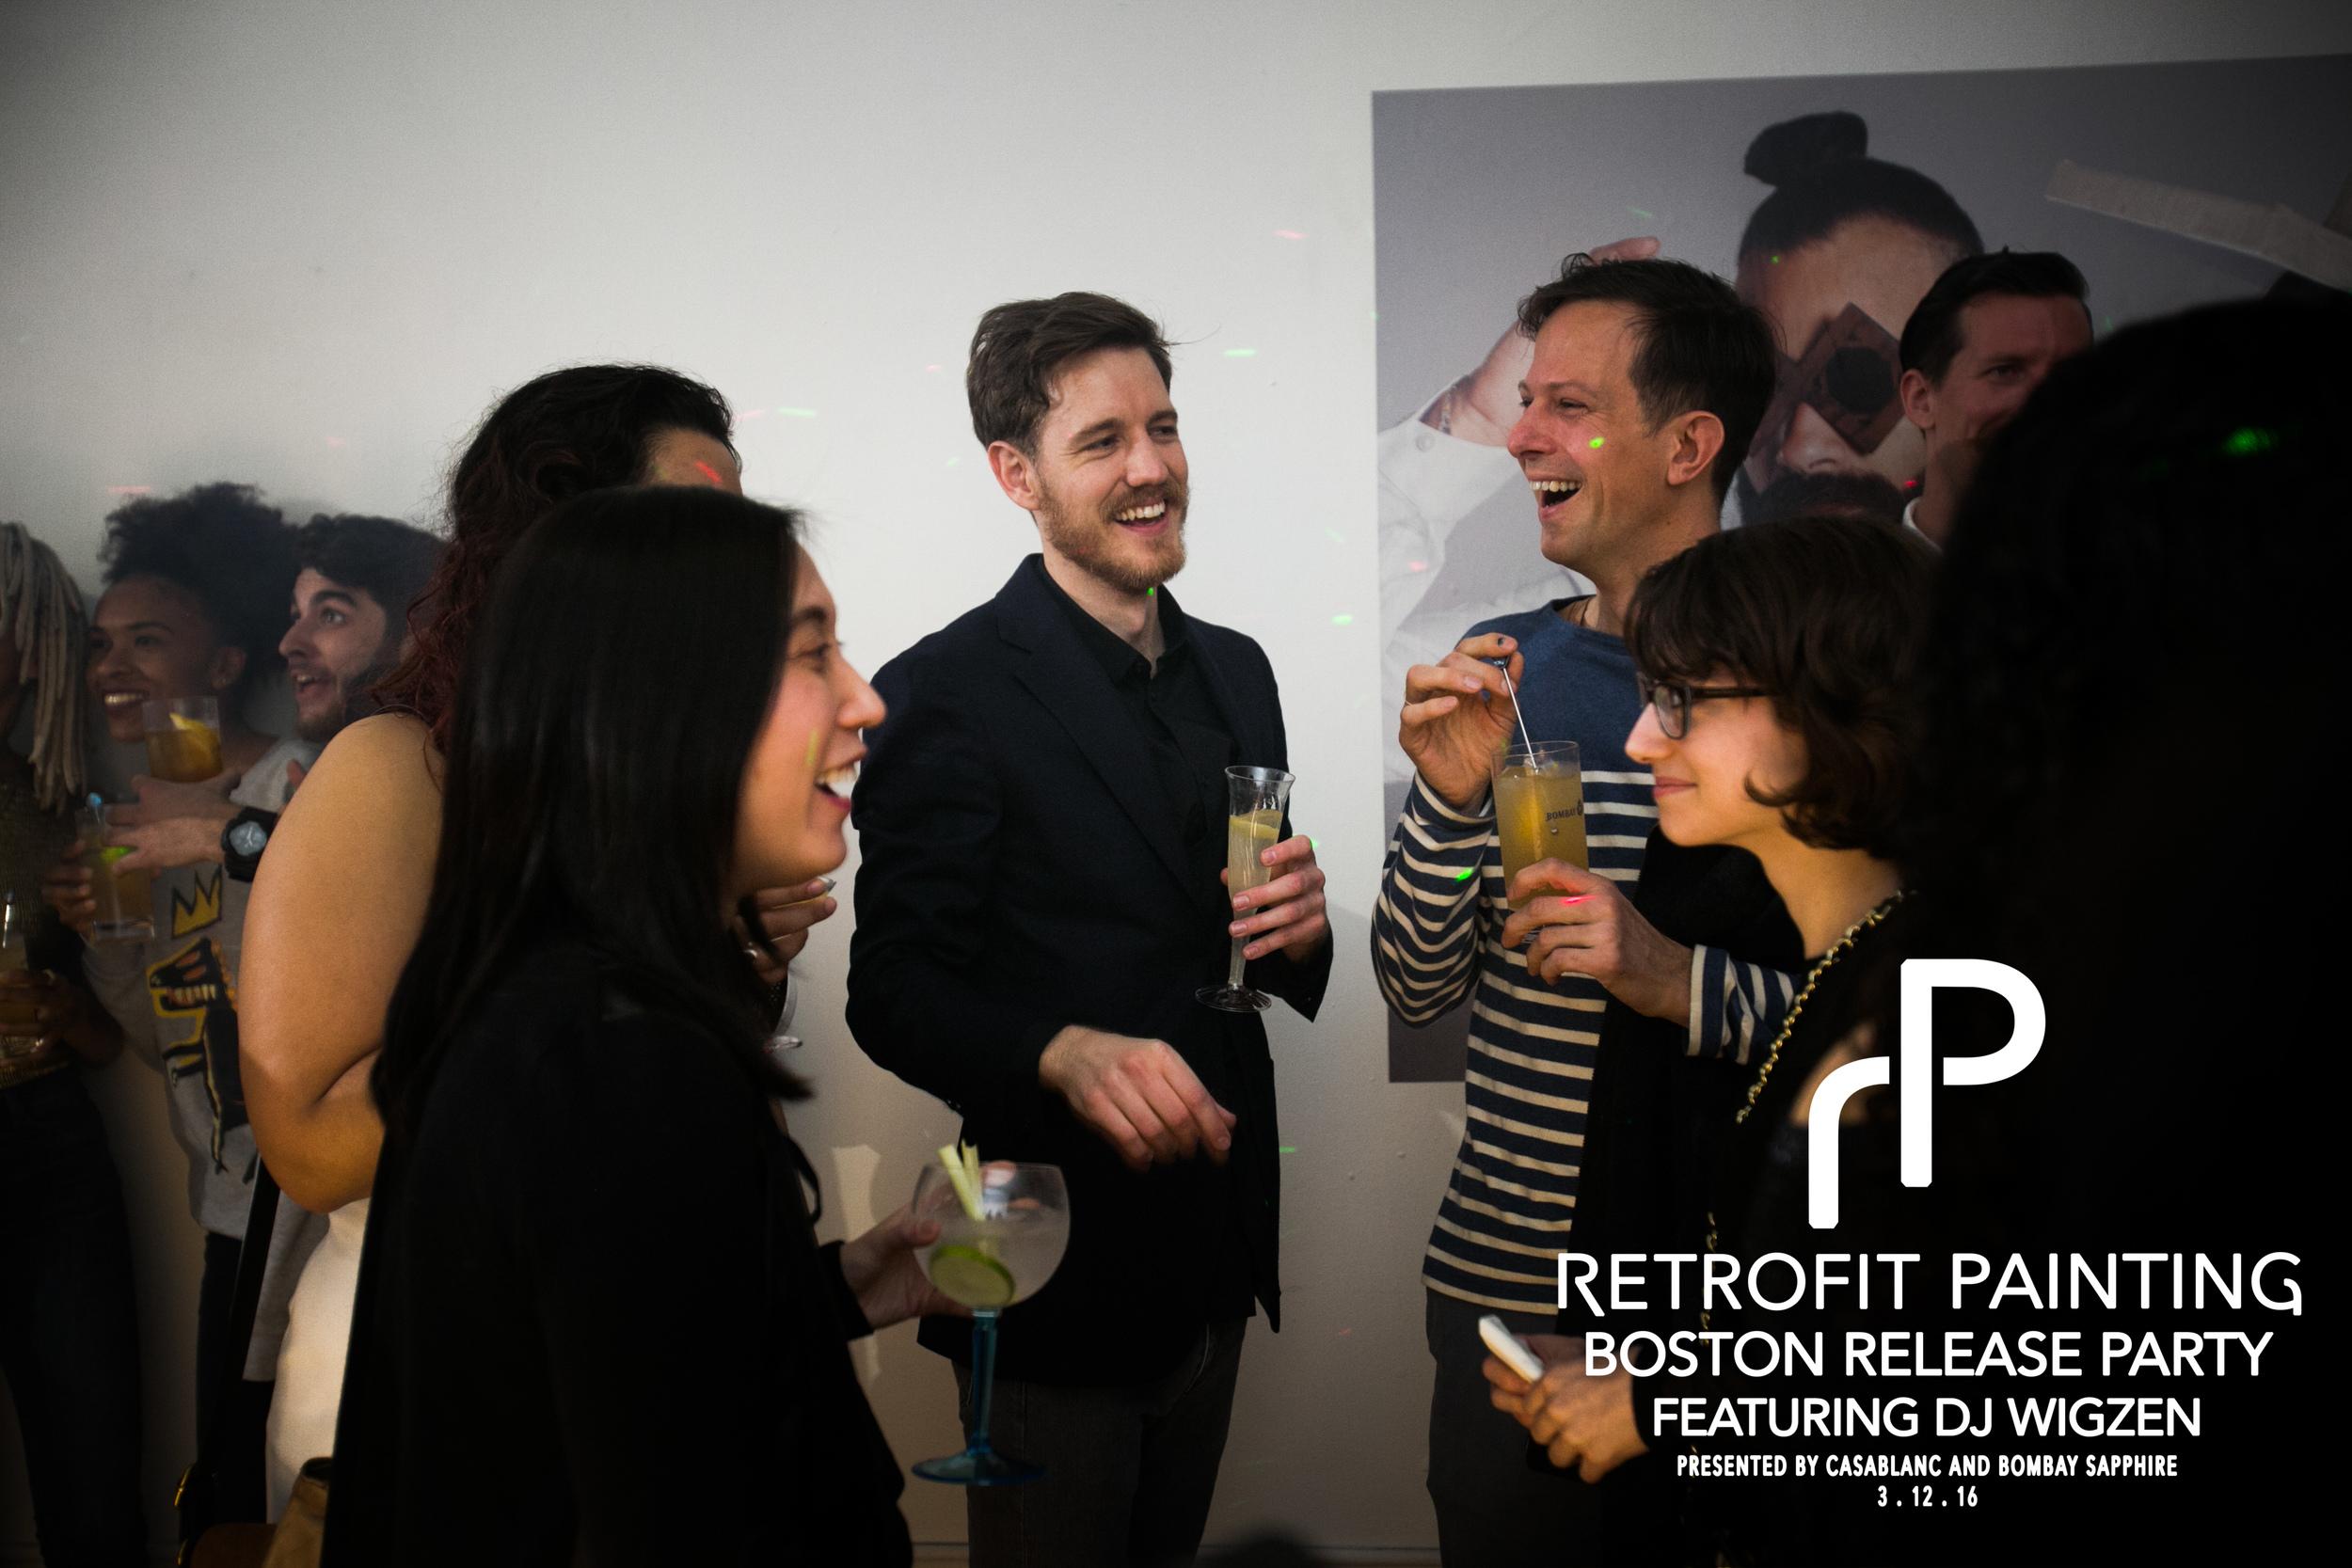 Retrofit Painting Boston Release Party 0201.jpg